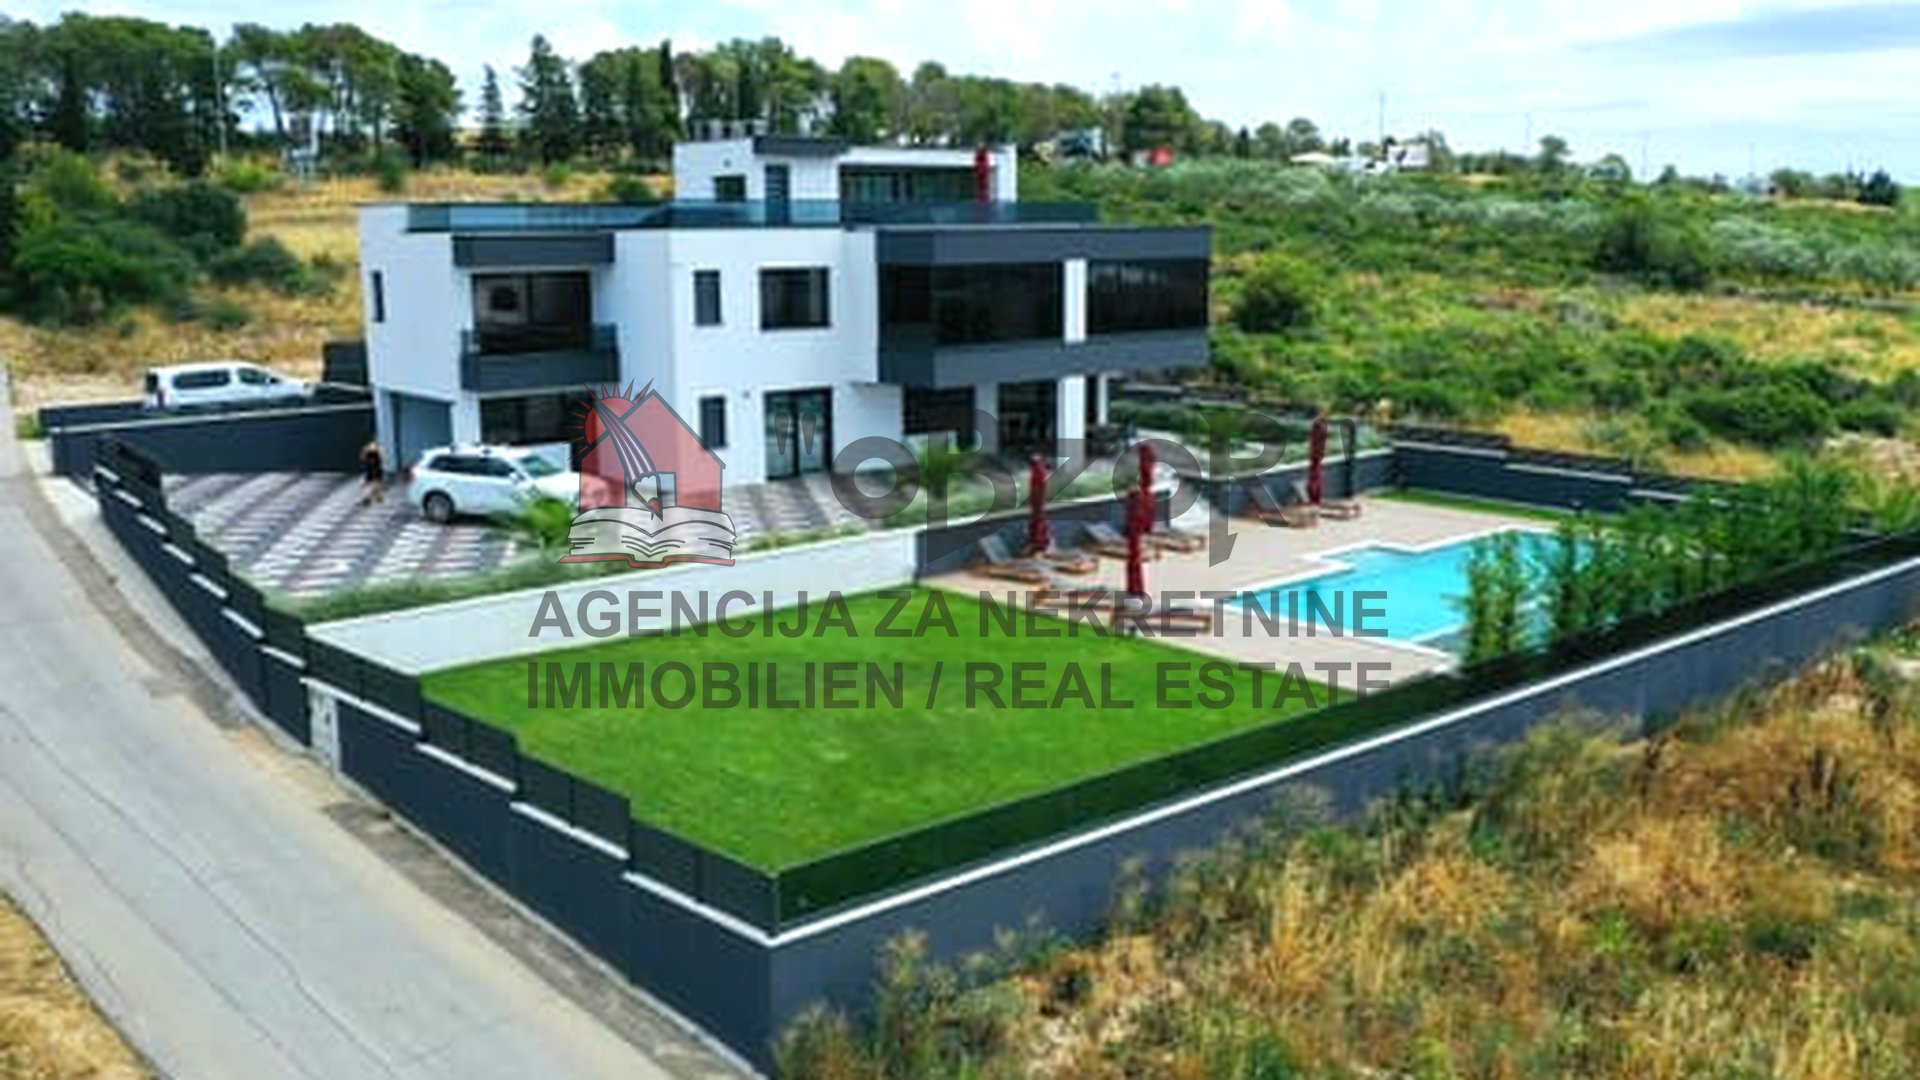 Casa, 623 m2, Vendita, Zadar - Vidikovac